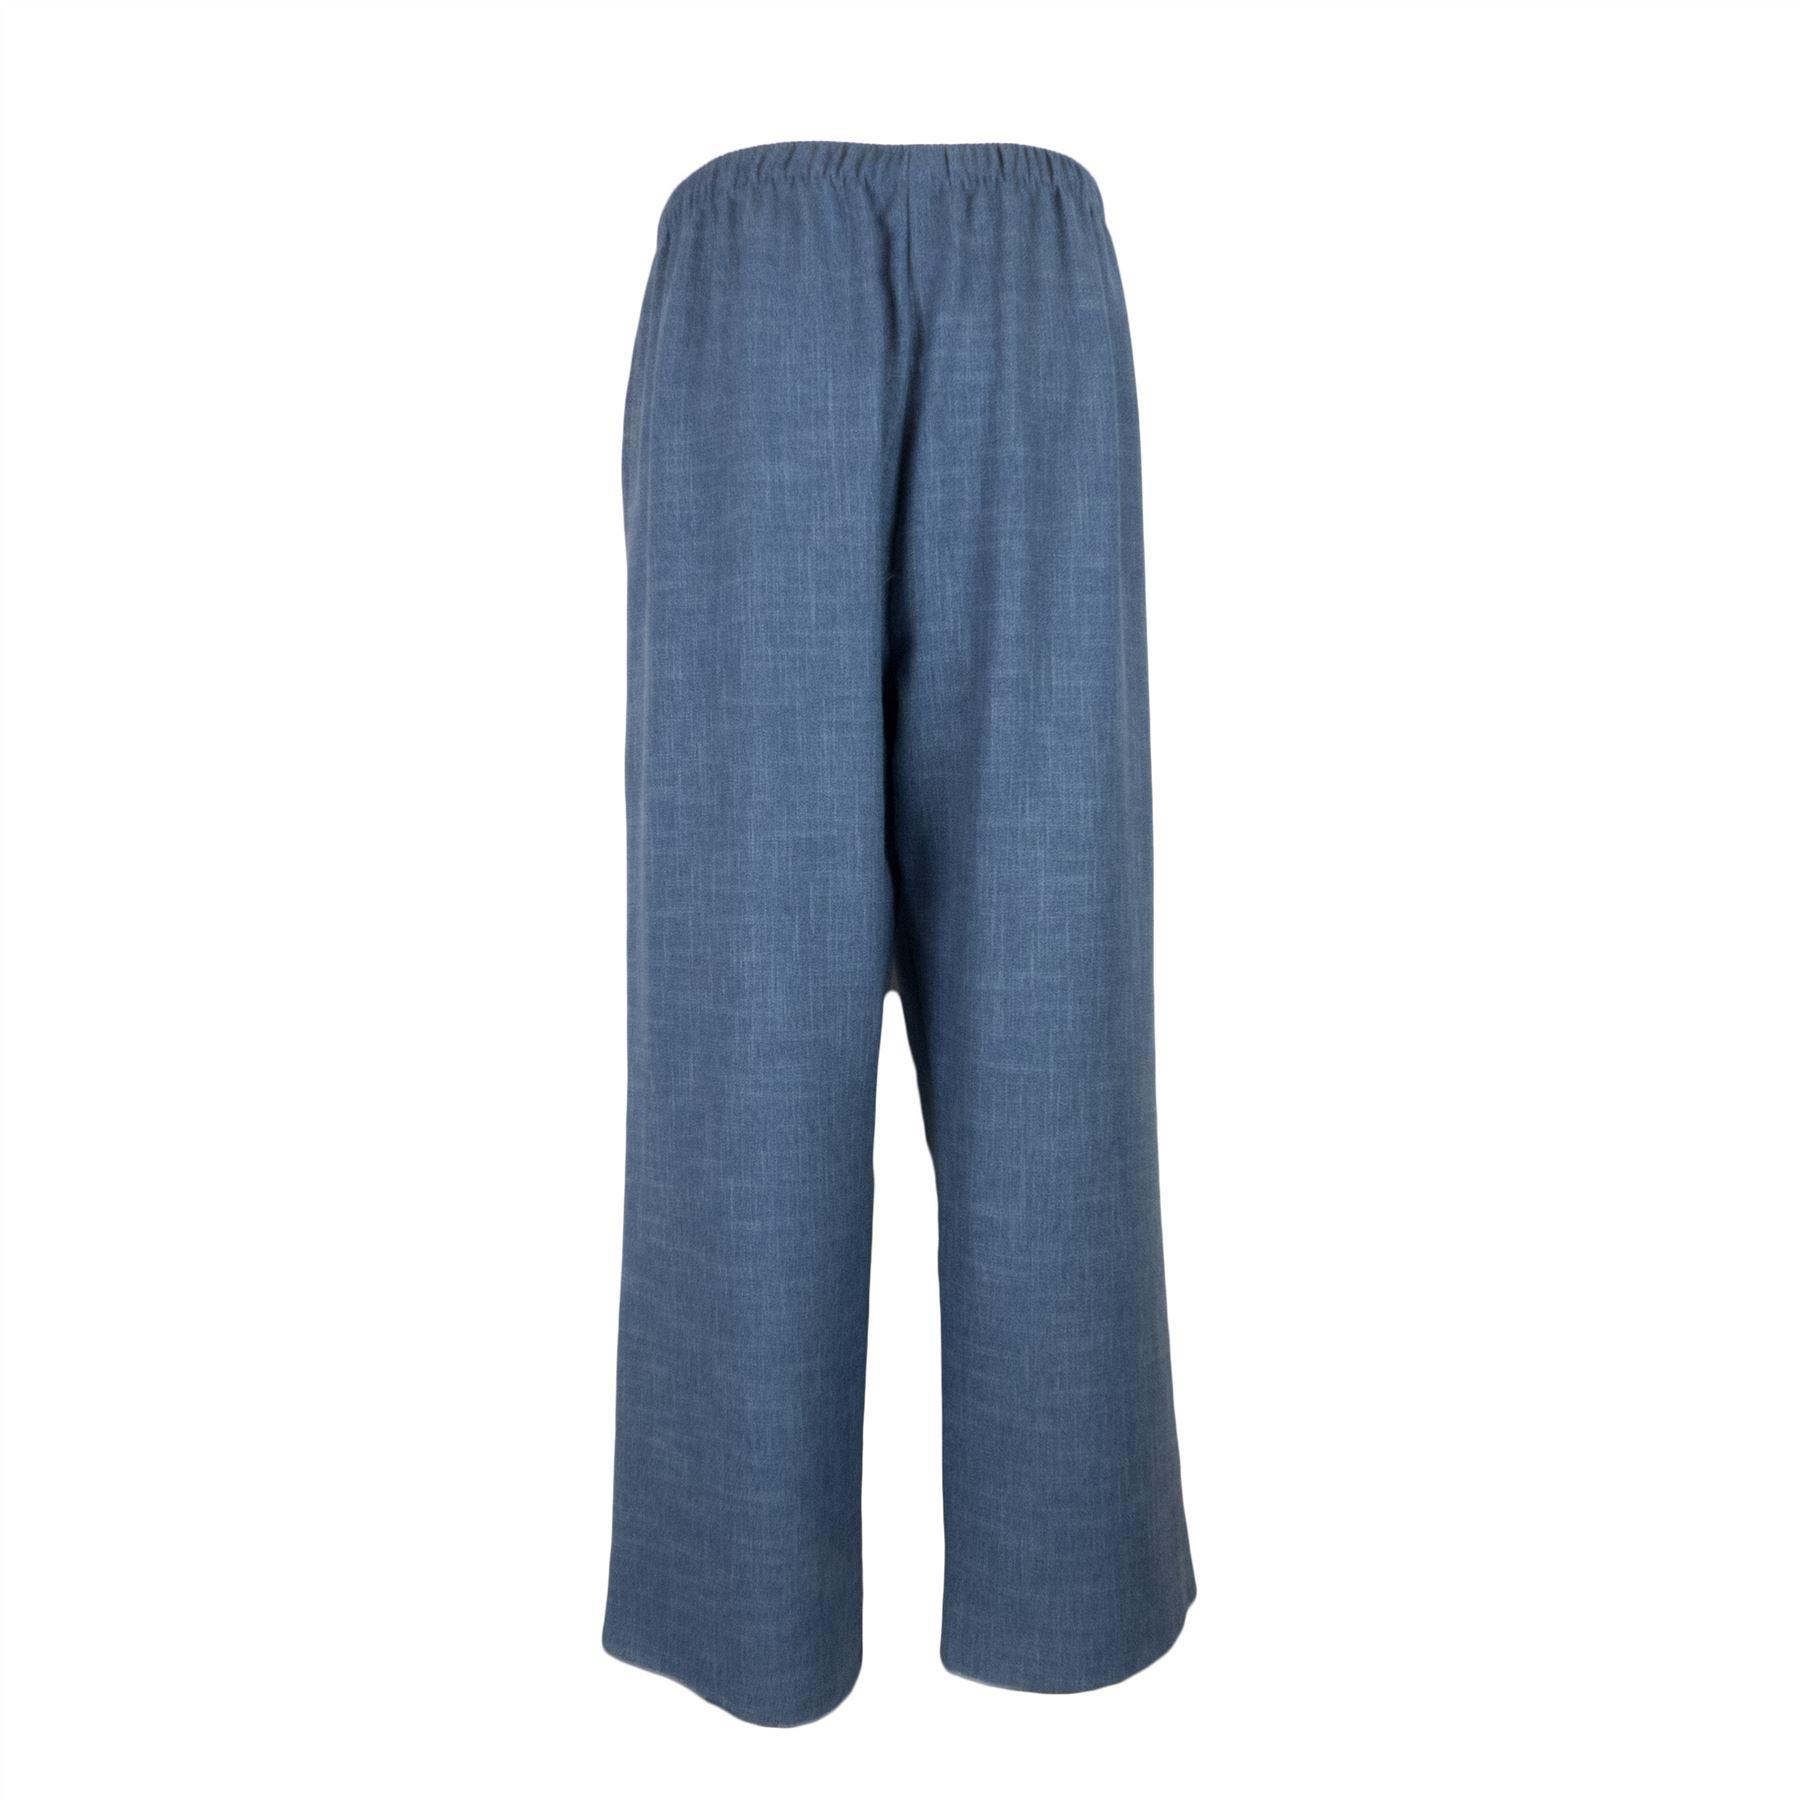 Saloos-Linen-Look-Trouser-Casual-or-Eveningwear-Elasticated-Waist thumbnail 11